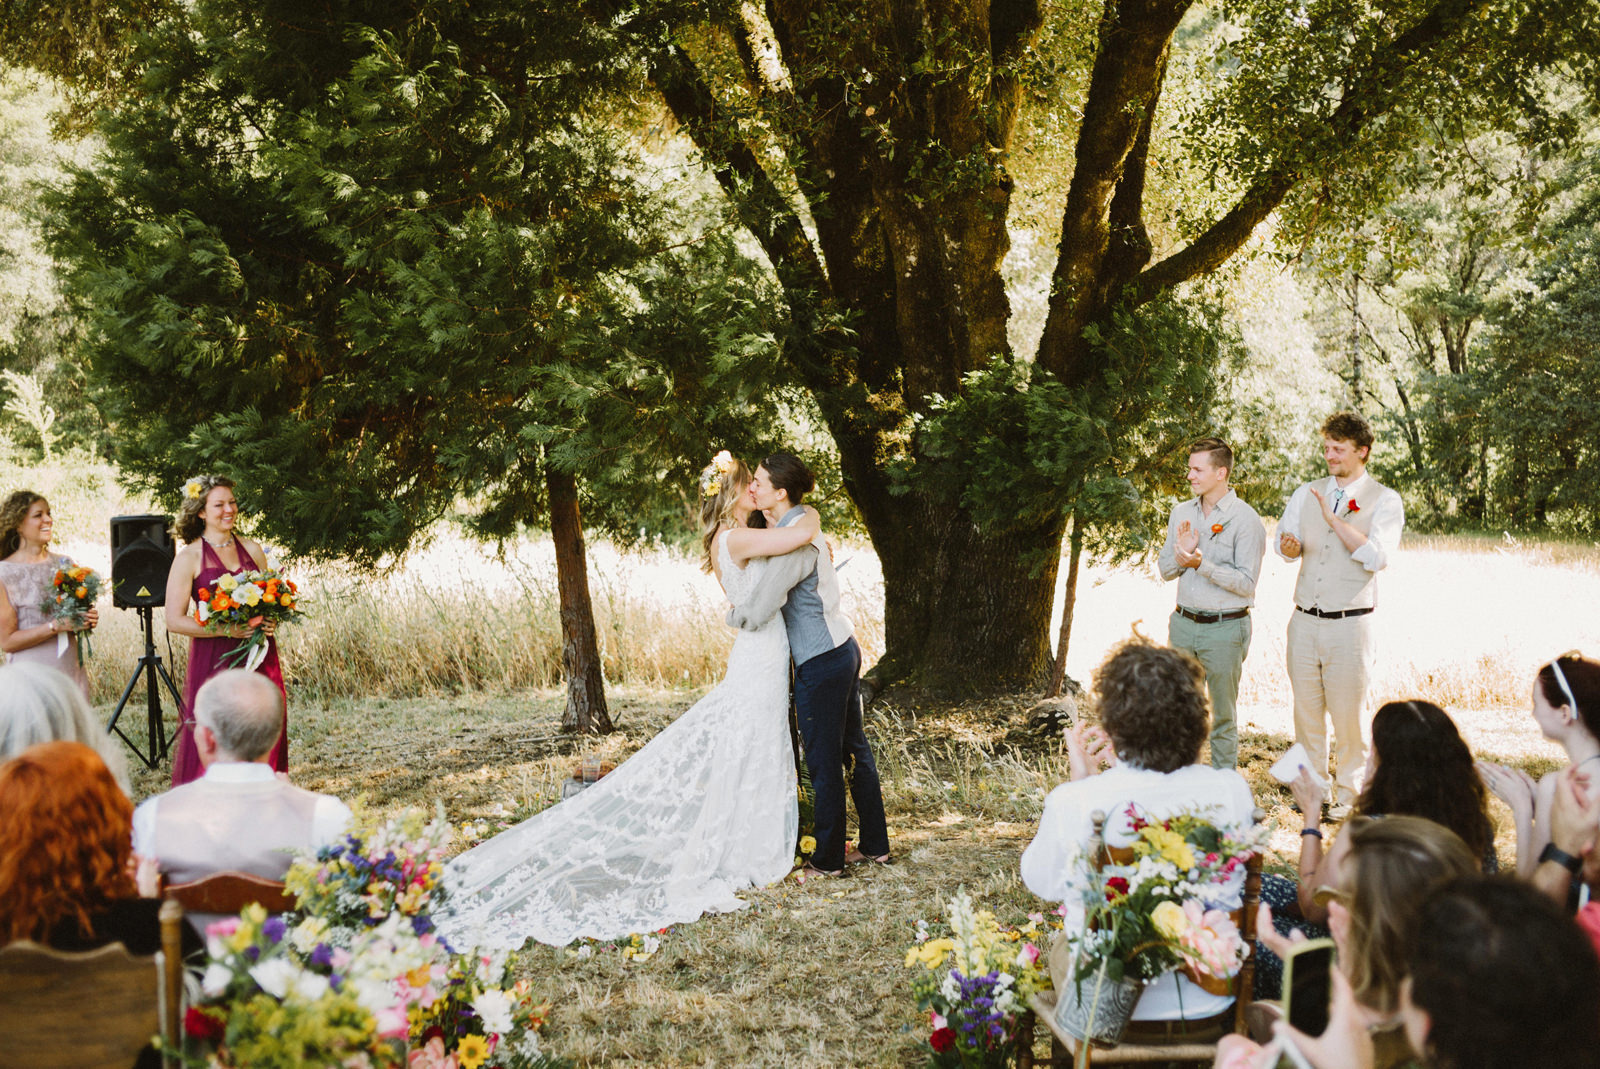 rivers-bend-retreat-wedding-035 RIVER'S BEND RETREAT WEDDING